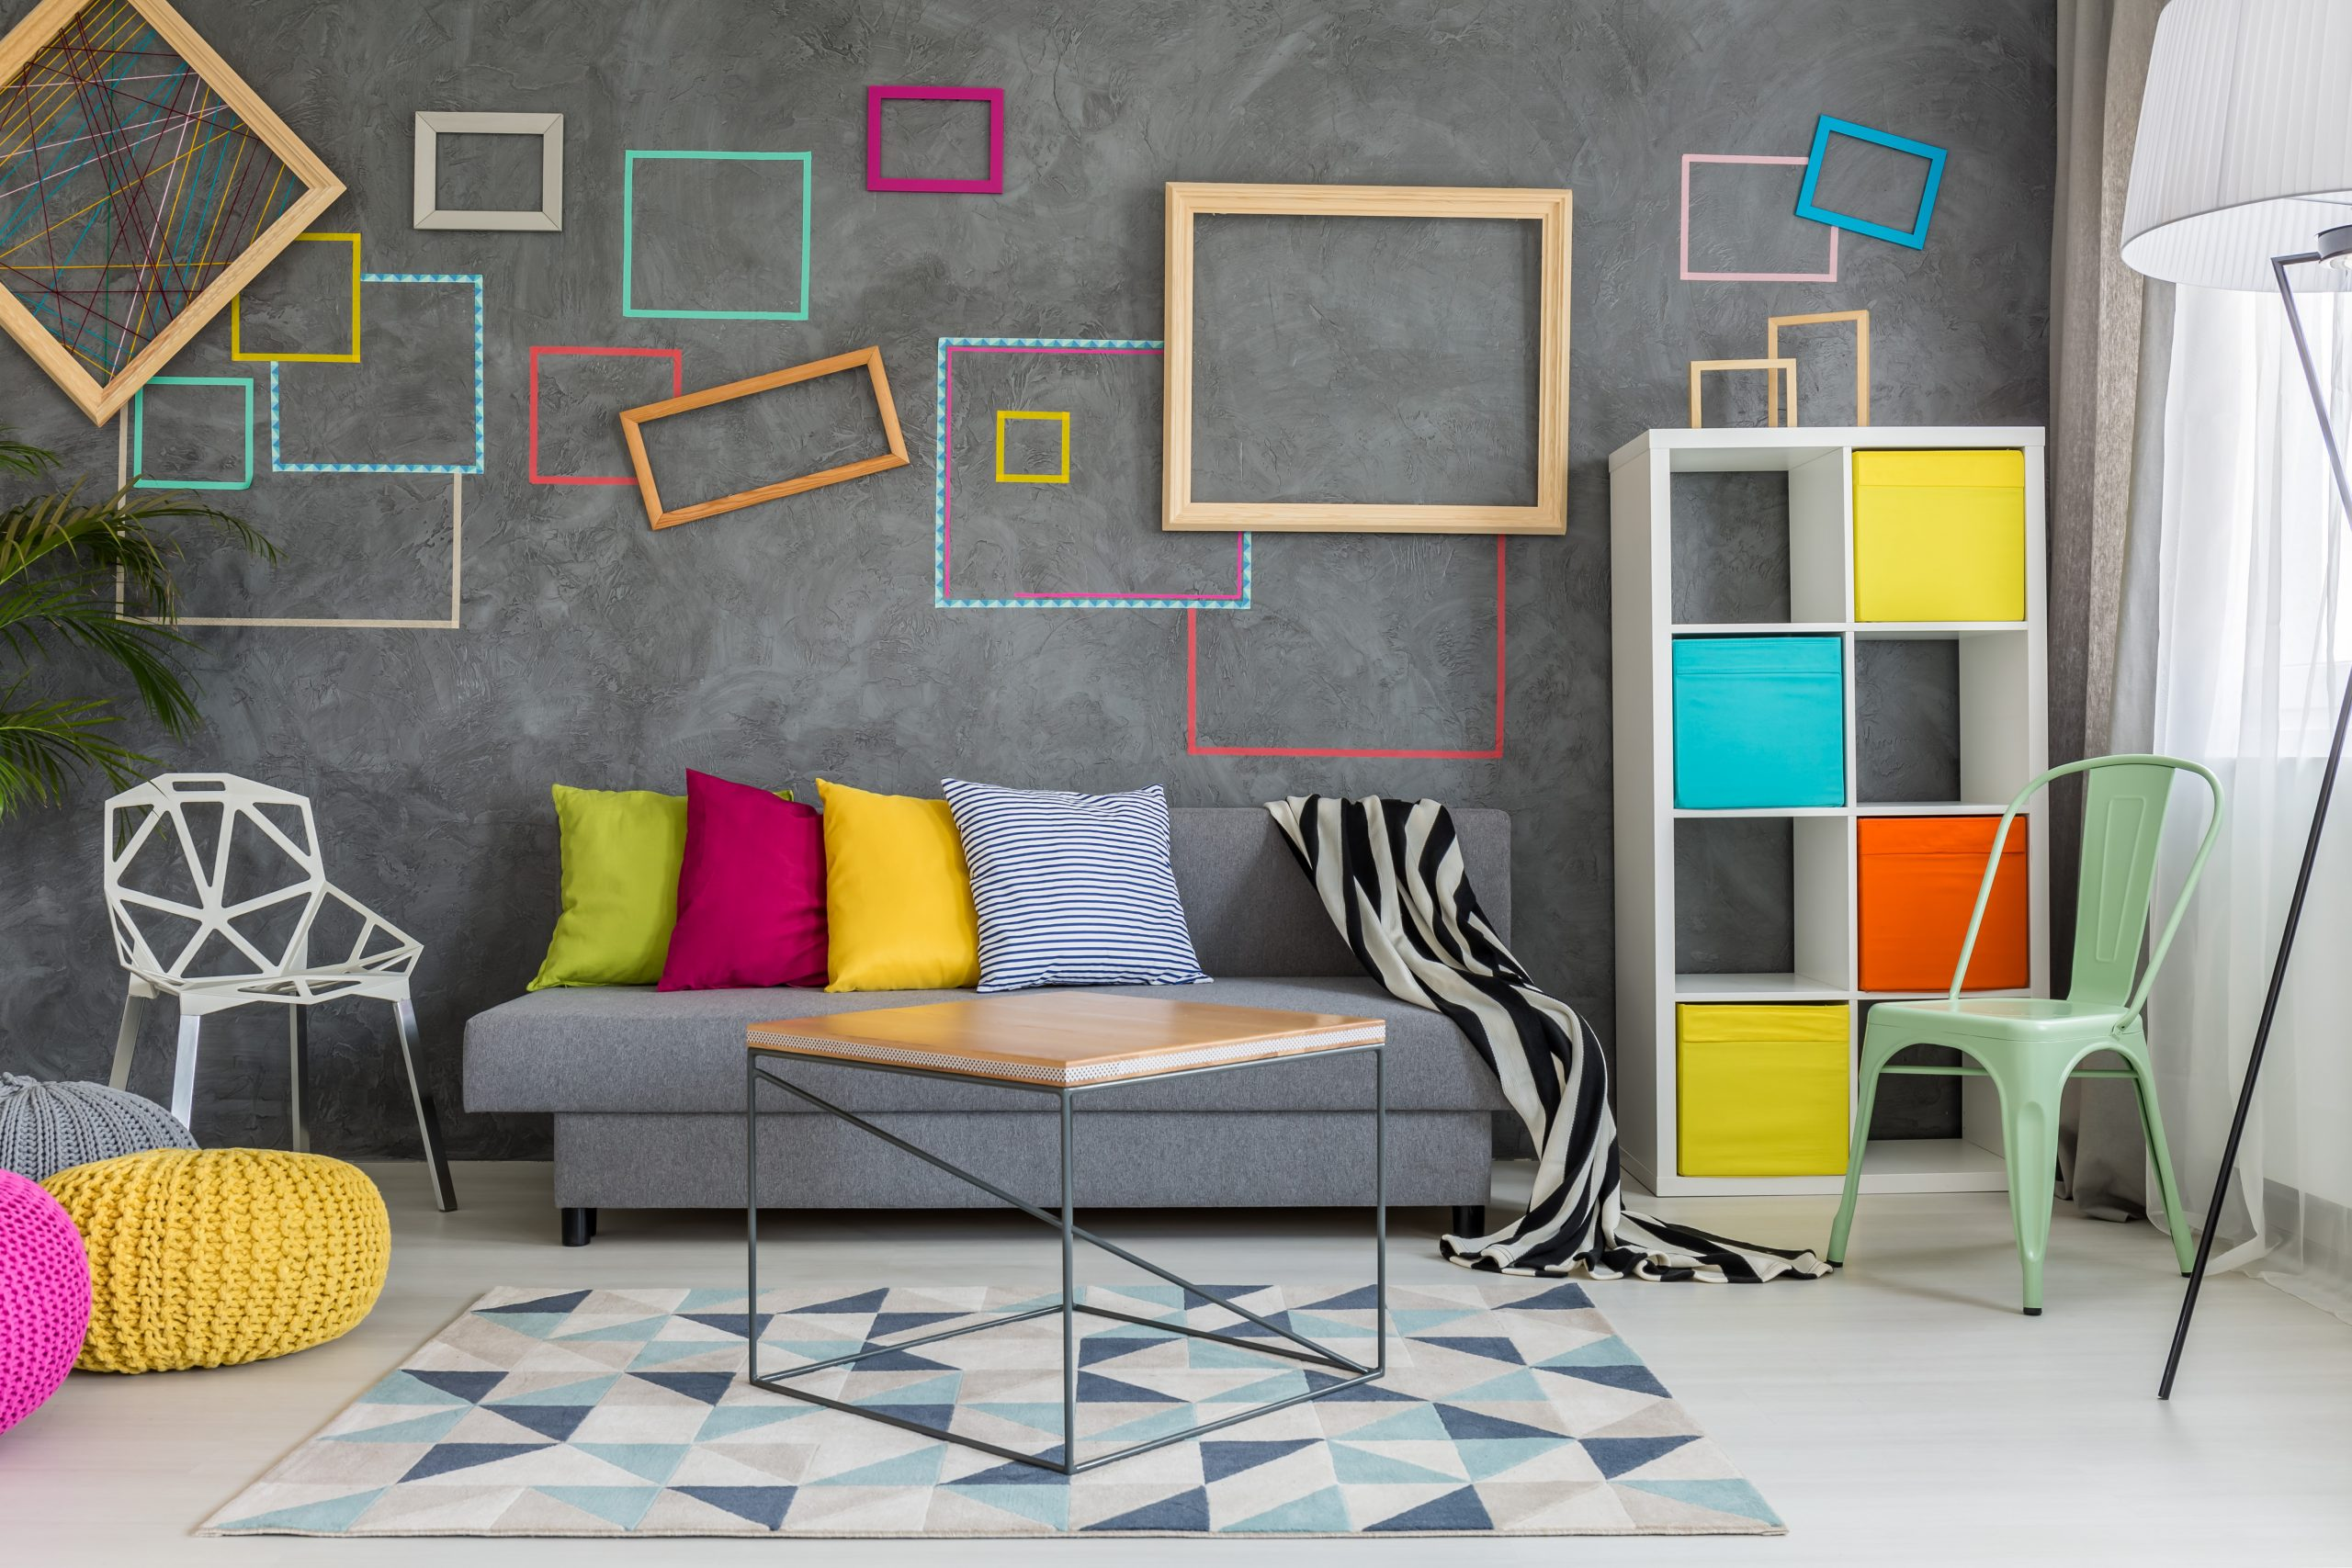 Le Home-staging : Optimiser son bien immobilier